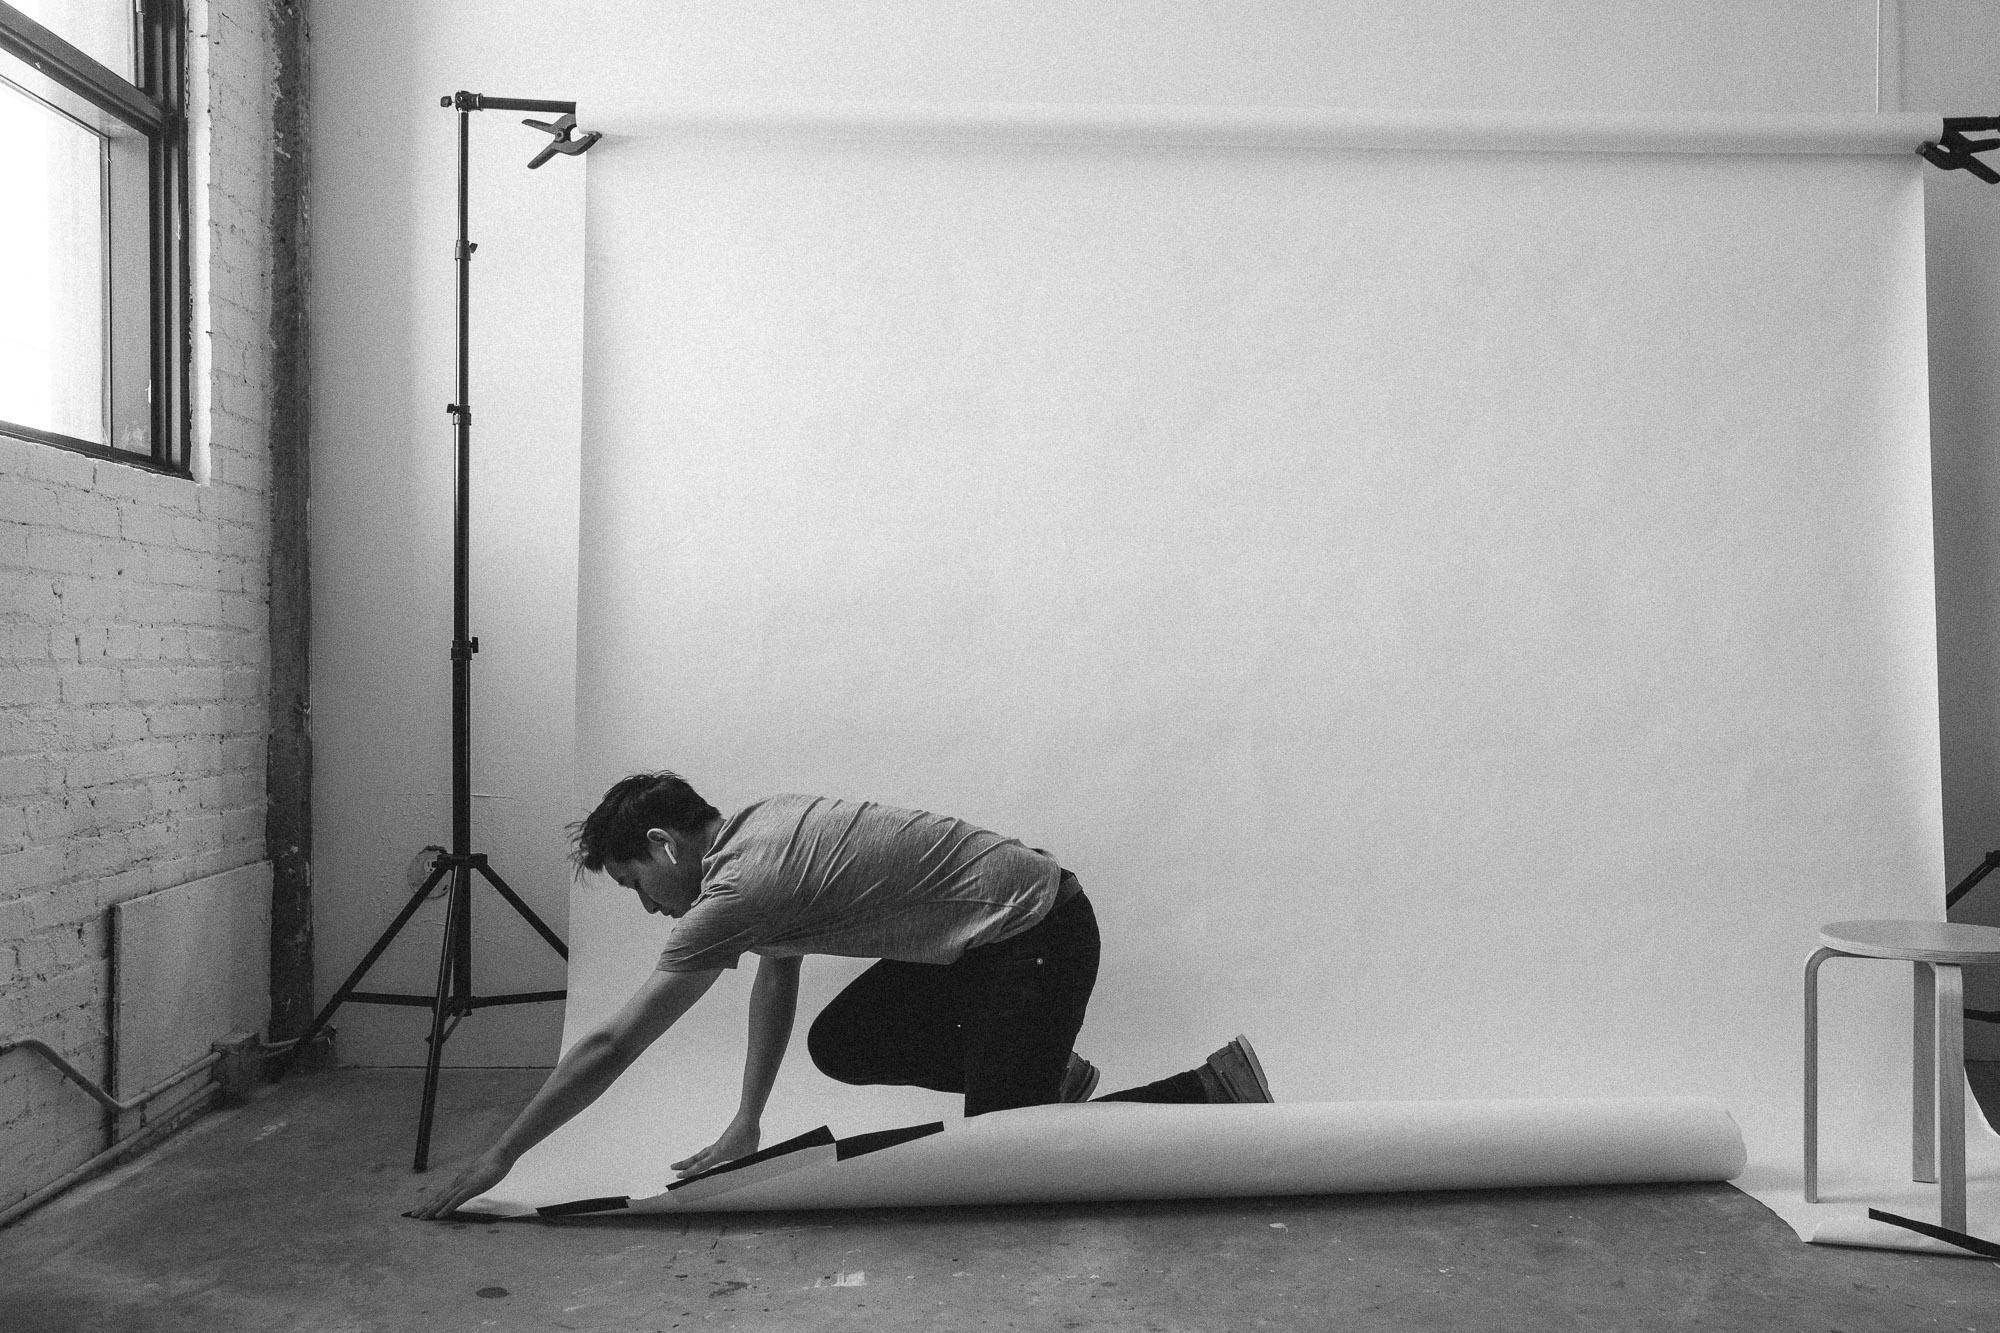 luminarium-photography-studio-in-montreal